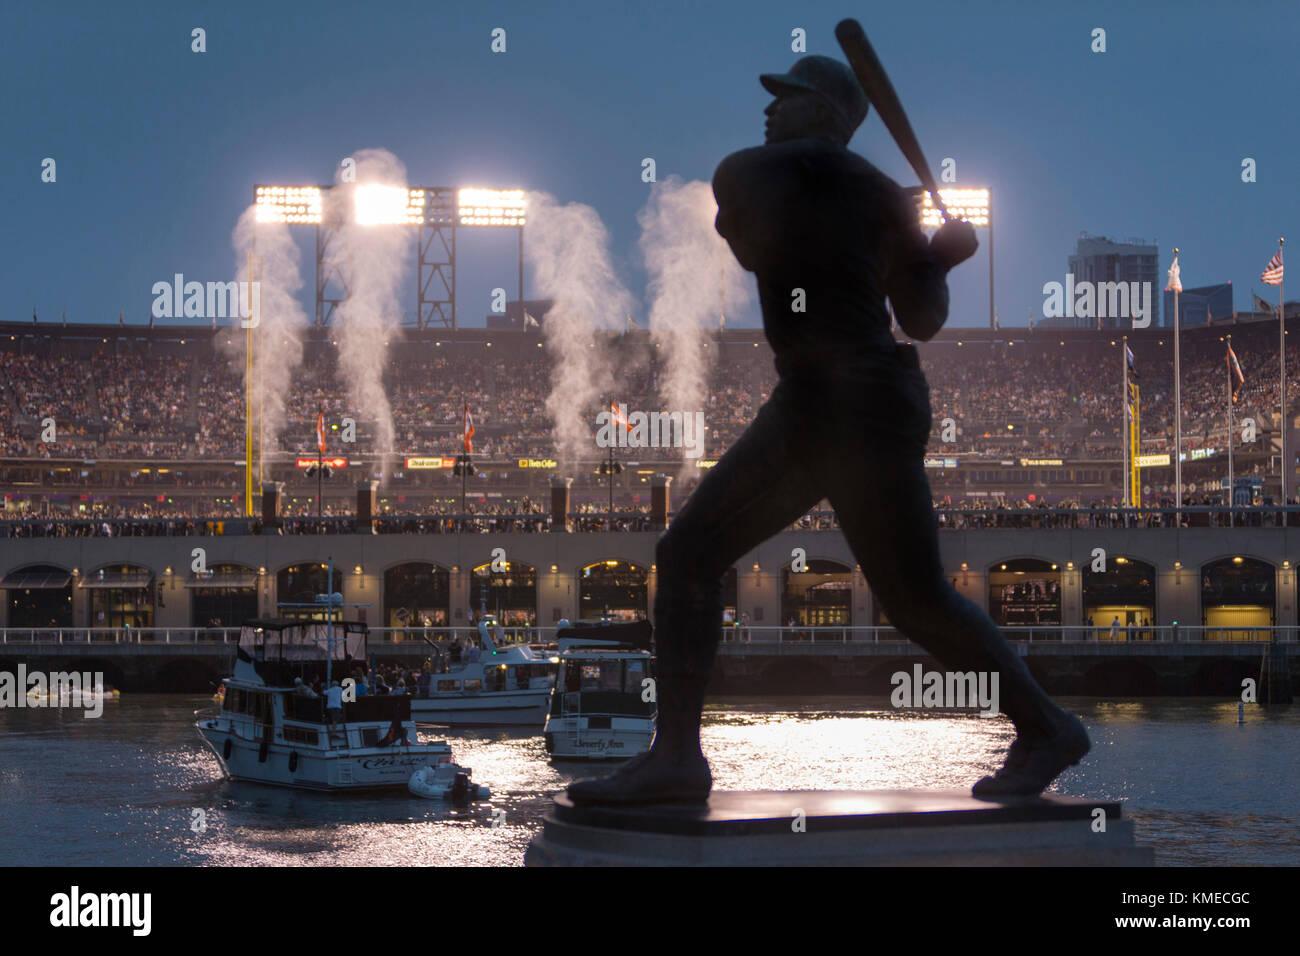 Att Ballpark, hogar del equipo de béisbol de los Gigantes de San Francisco, San Francisco, California, EE.UU. Imagen De Stock